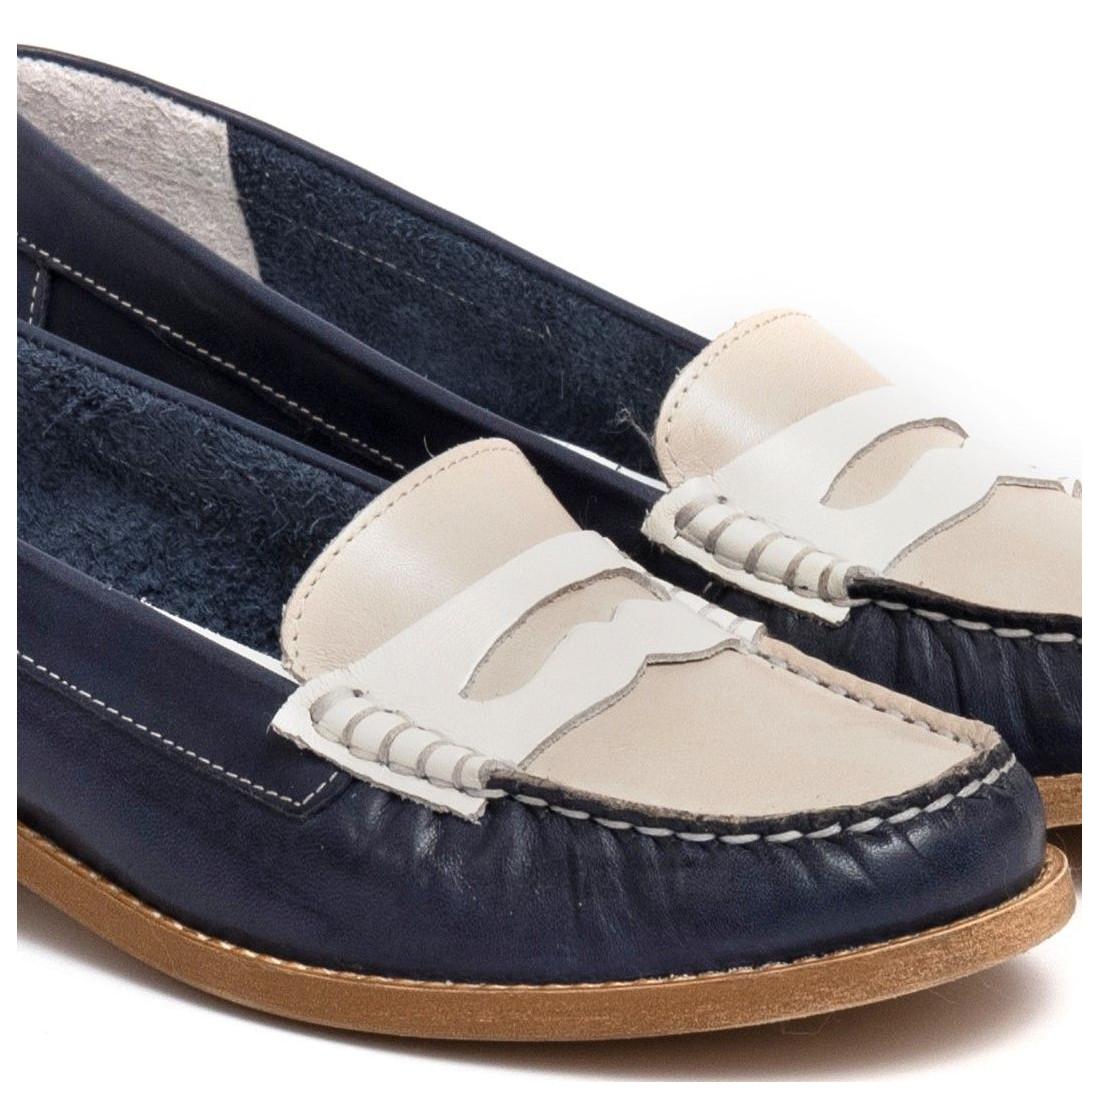 loafers woman sangiorgio 2593laura blu marmo 7342